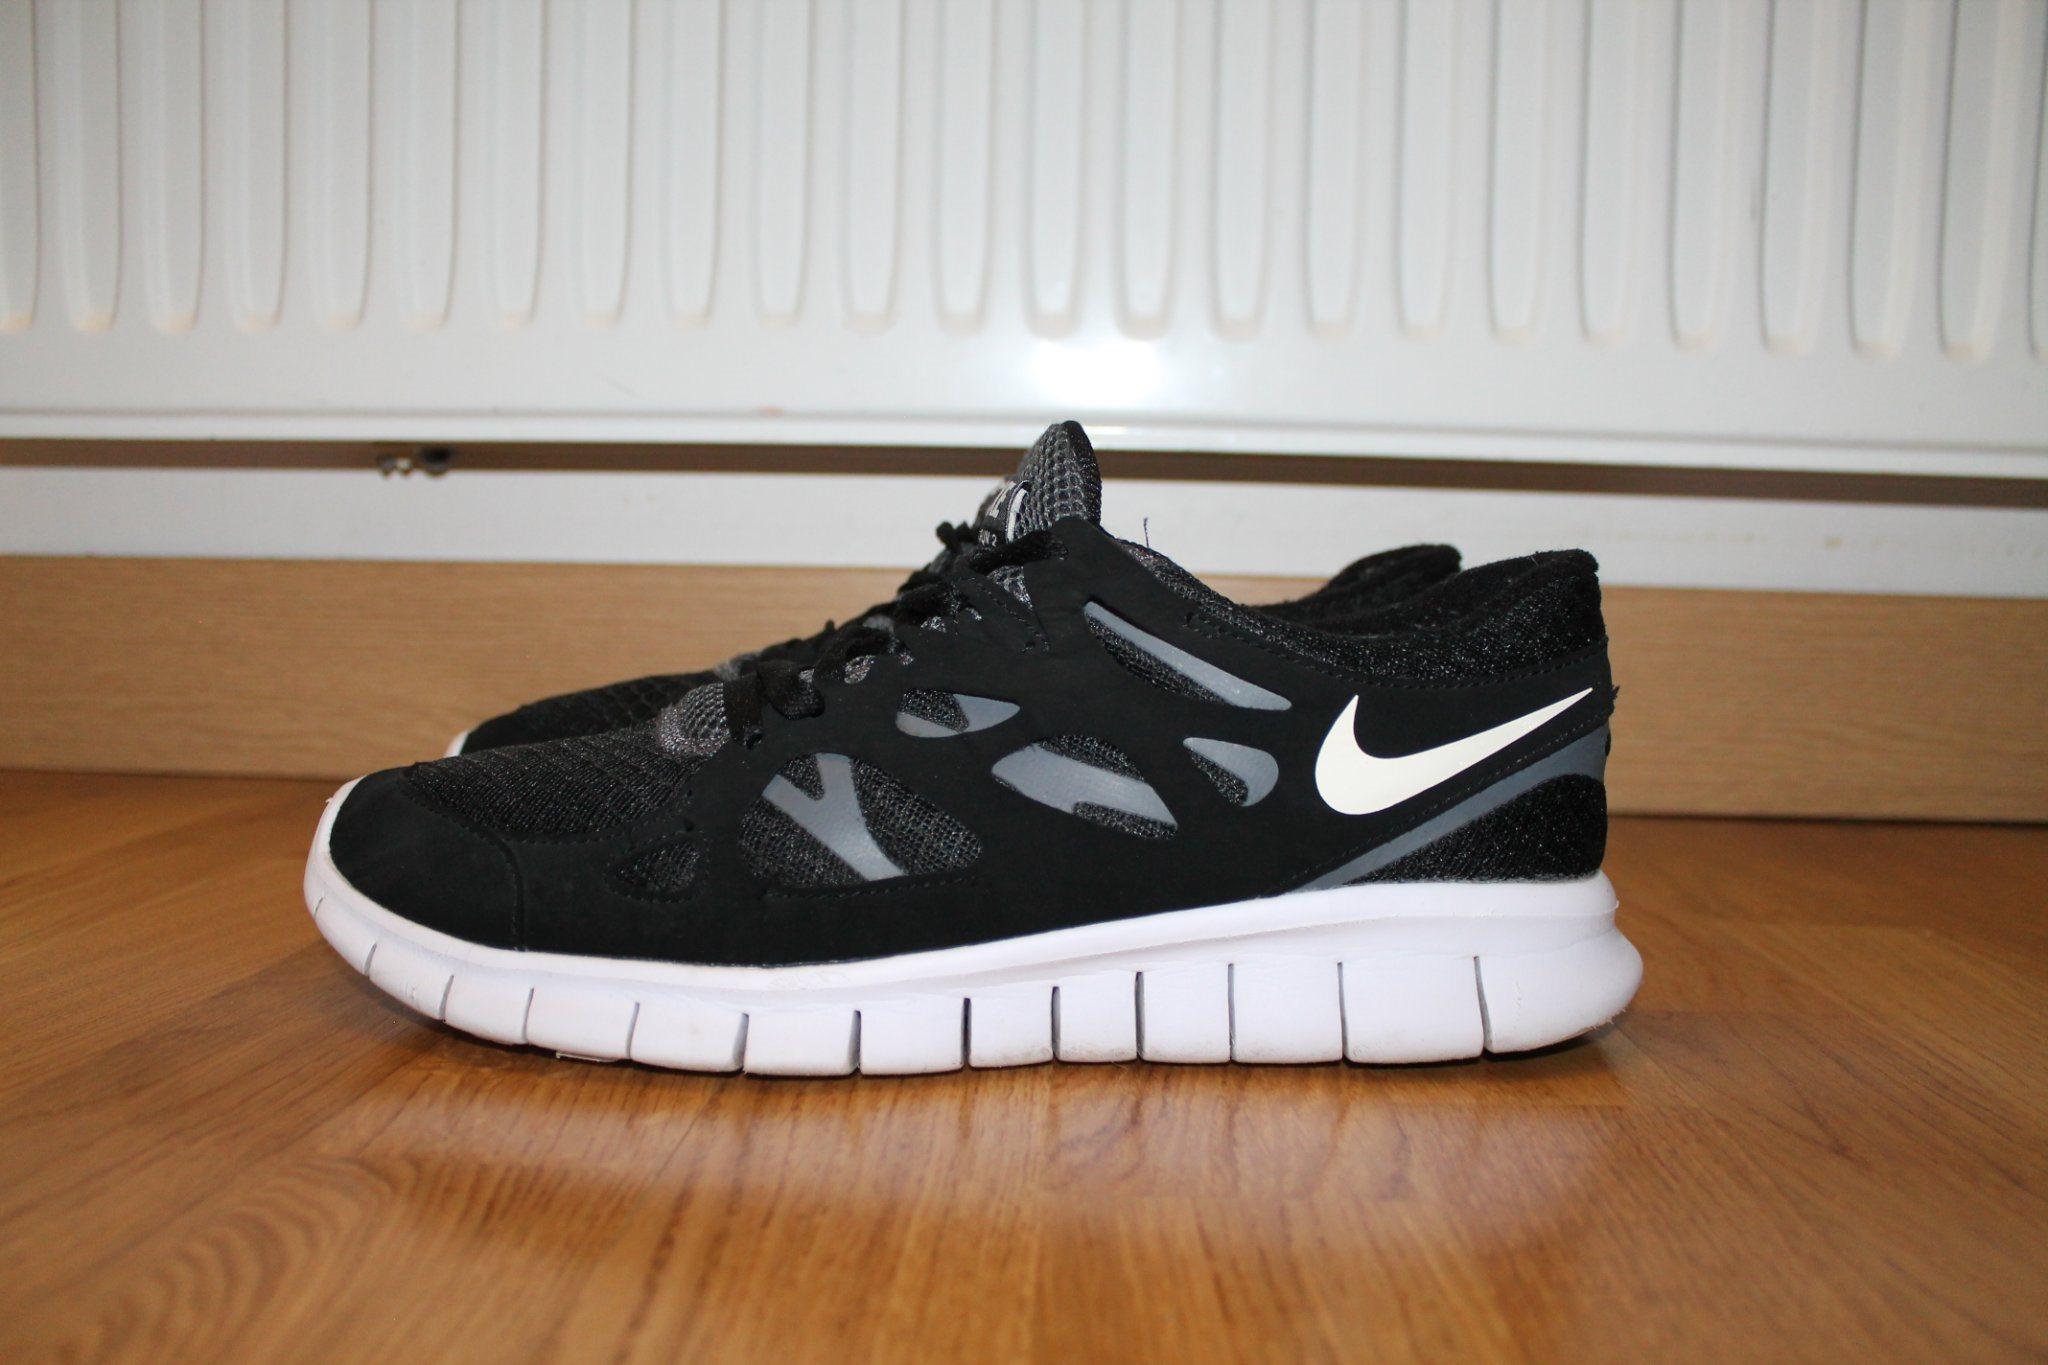 91bd7236965b6 Nike Free Run 2 Träningsskor i storlek 45 !!! f.. (344106747) ᐈ Köp ...